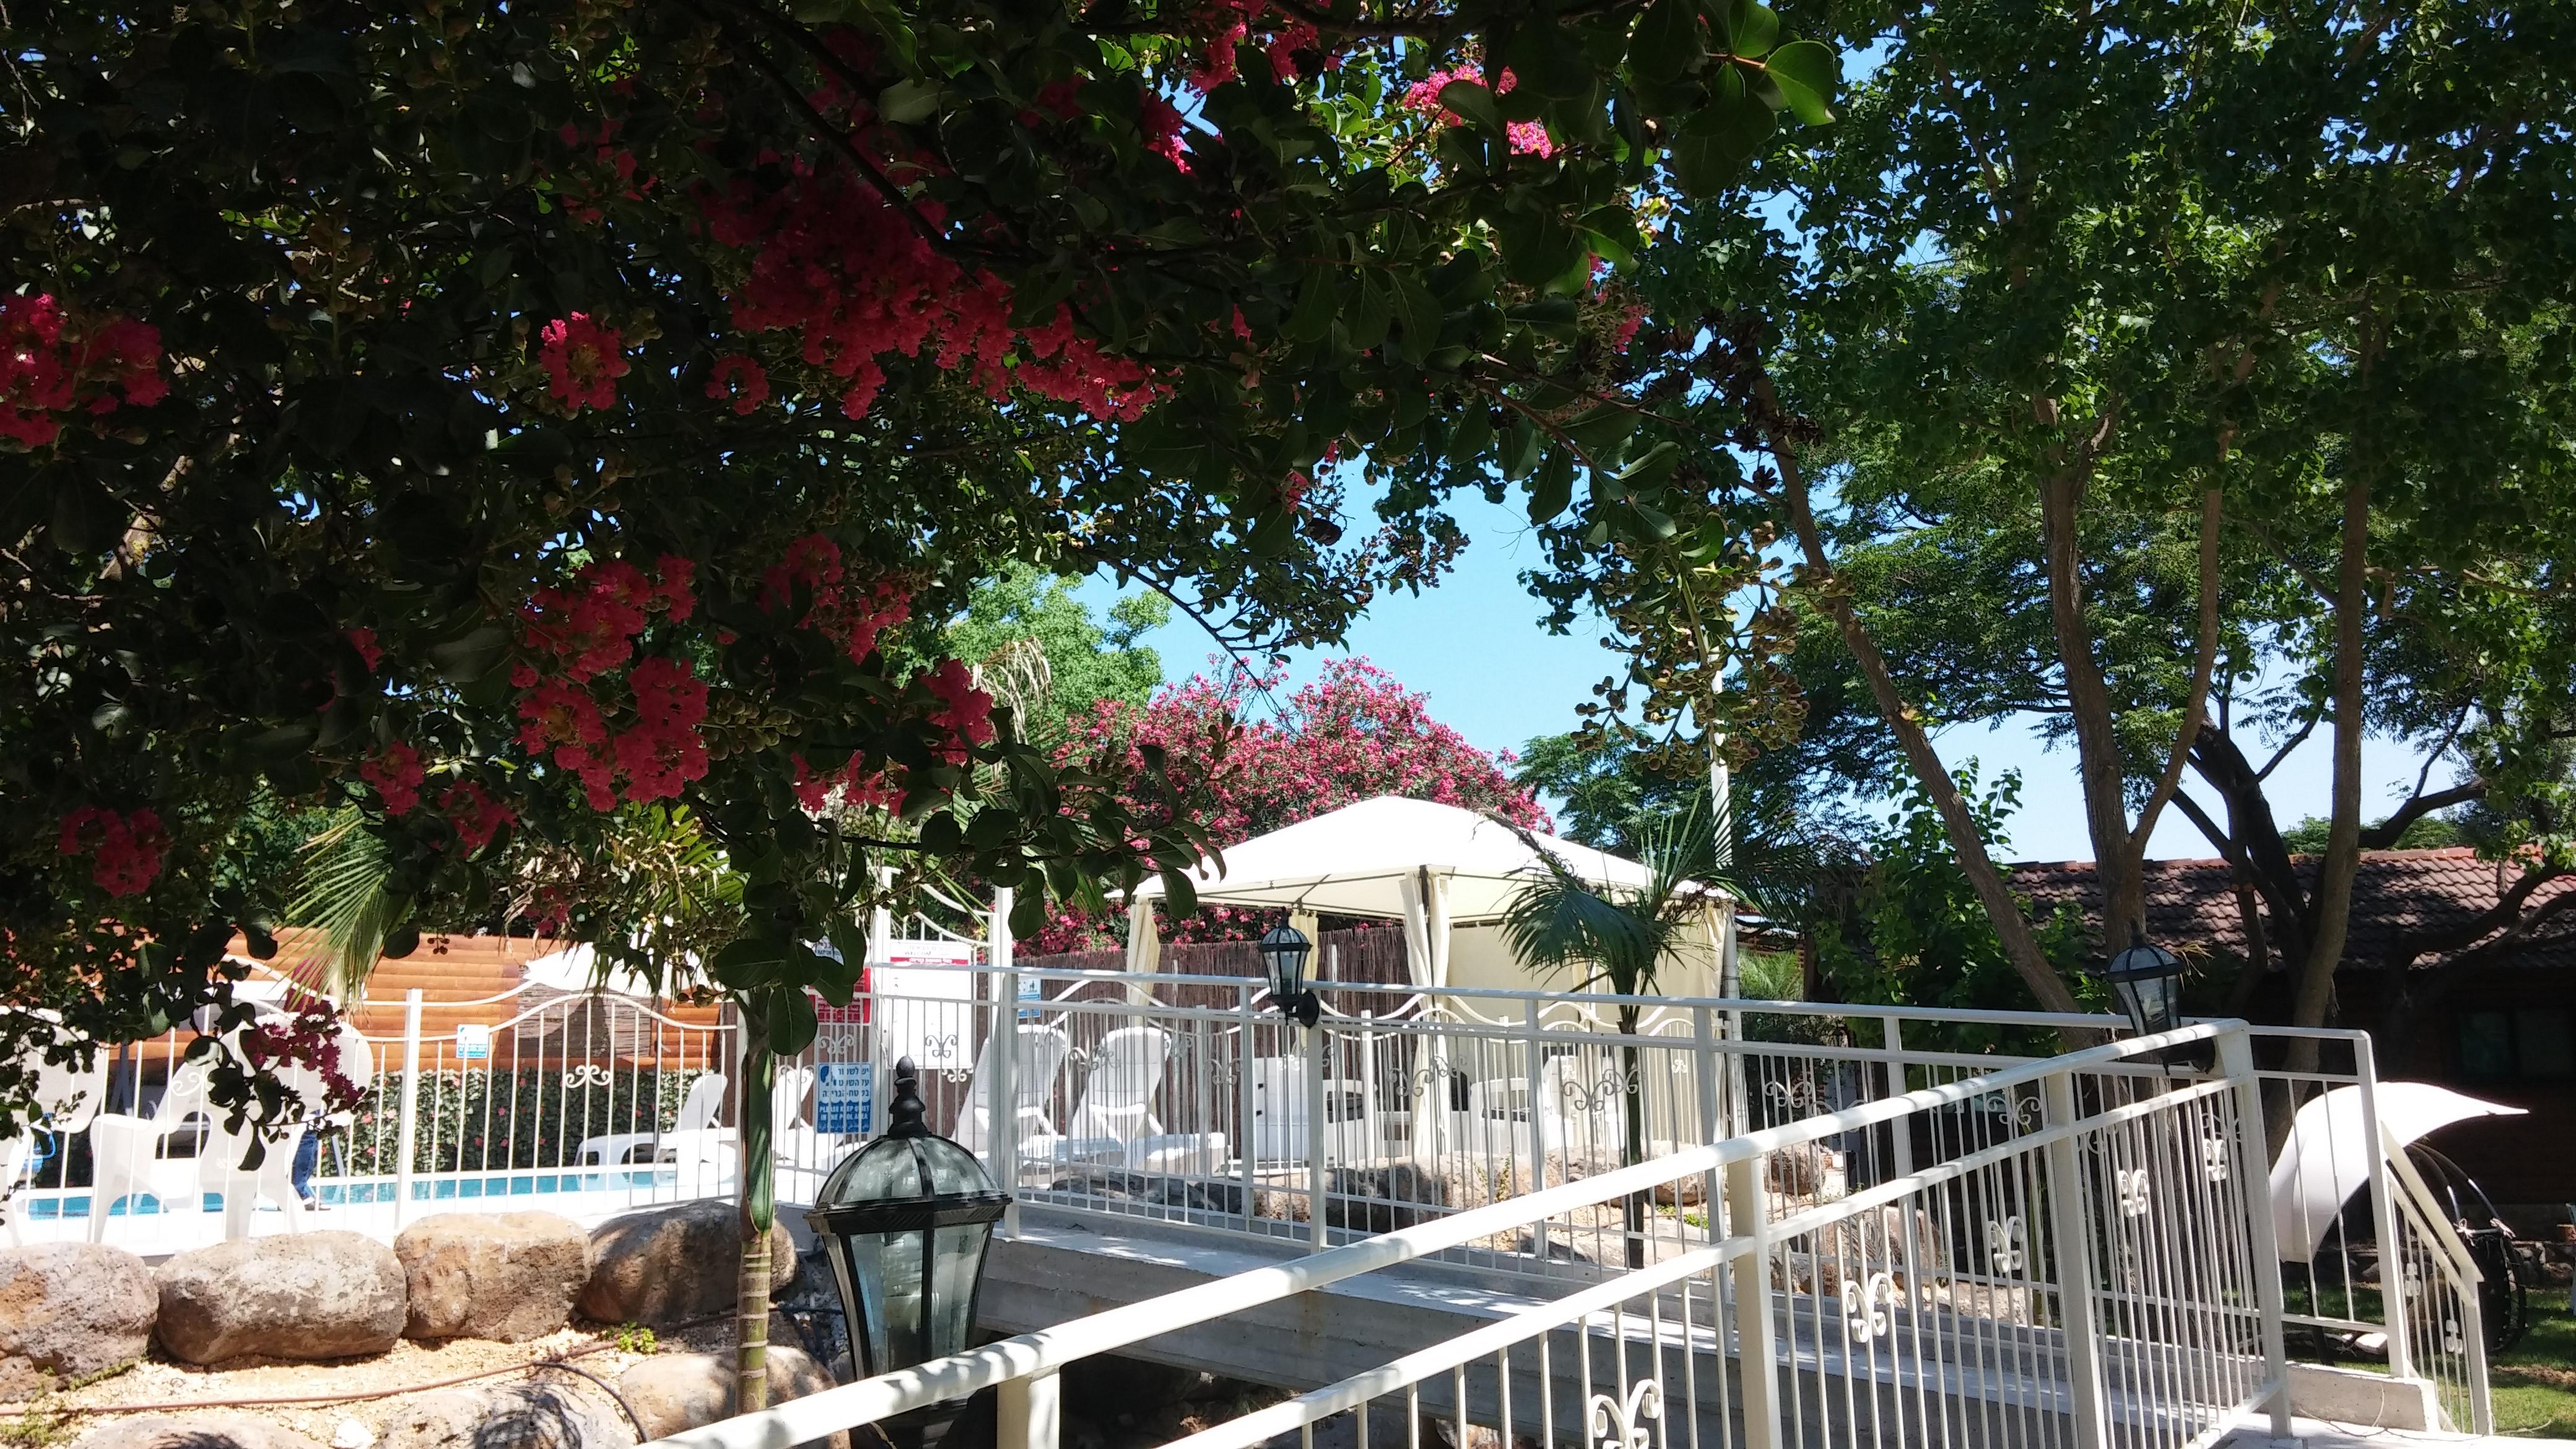 Pool bridge with Gazebo and blossom